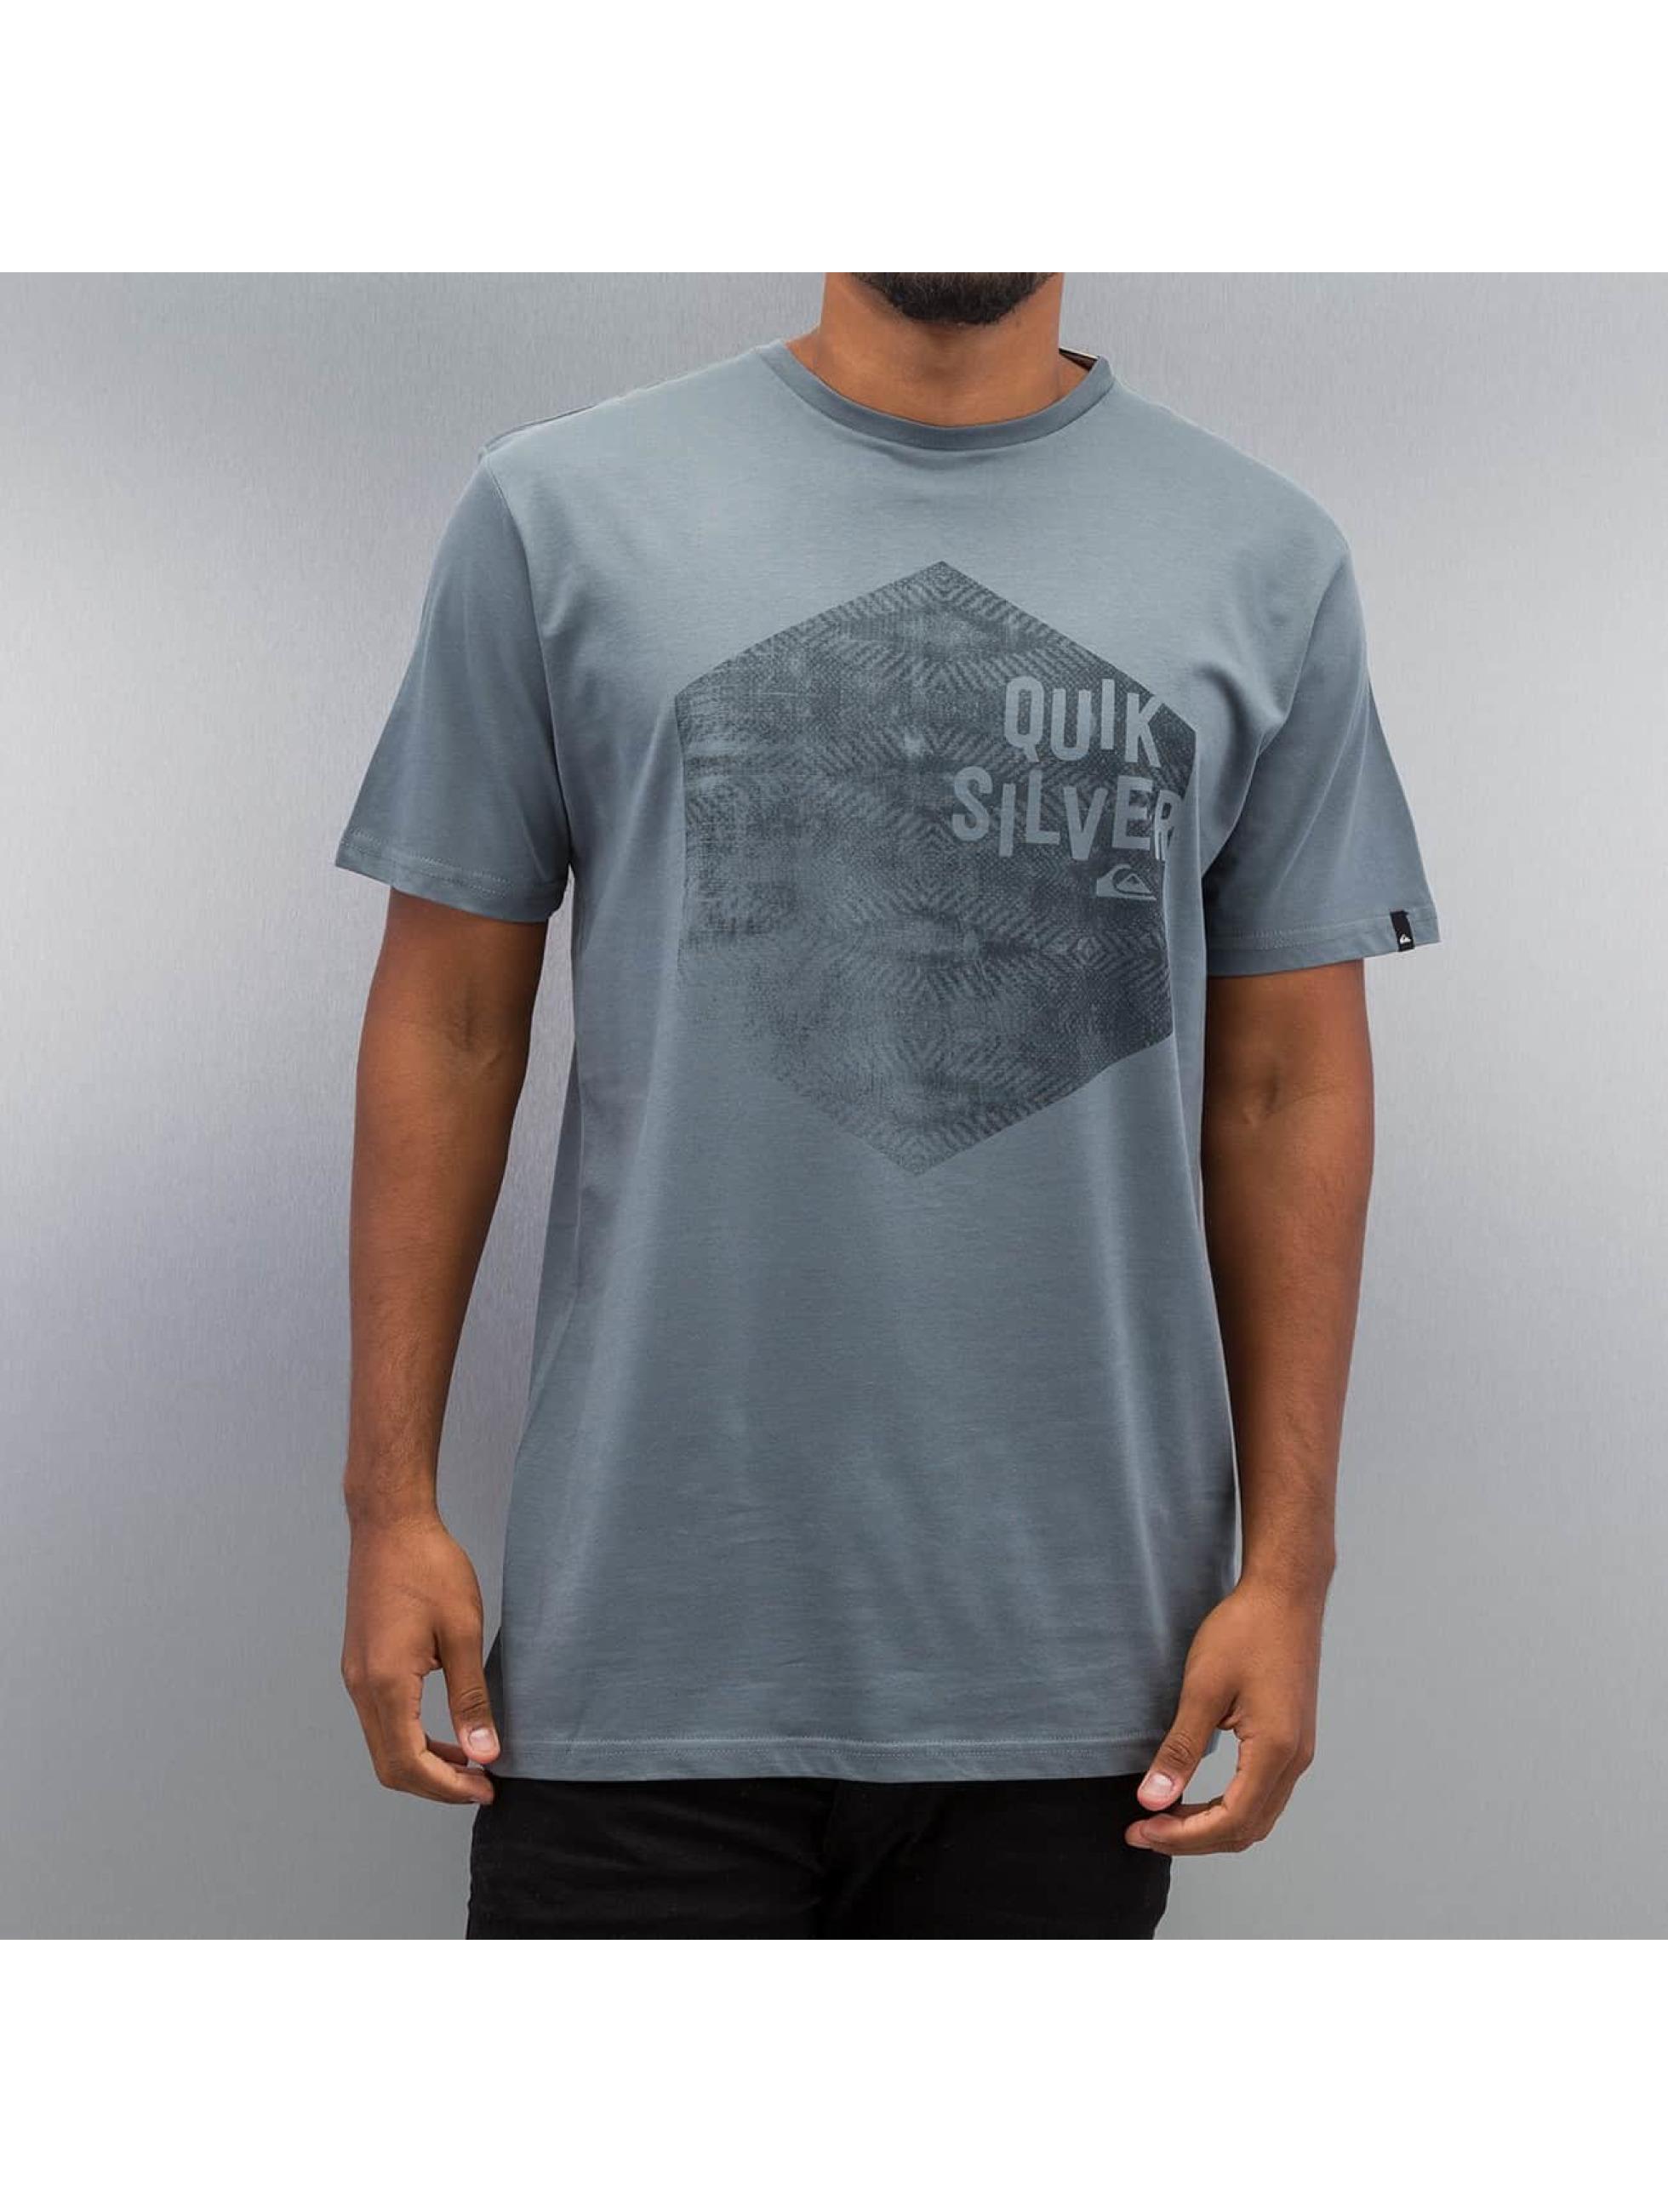 Quiksilver T-Shirt Jumbled blau